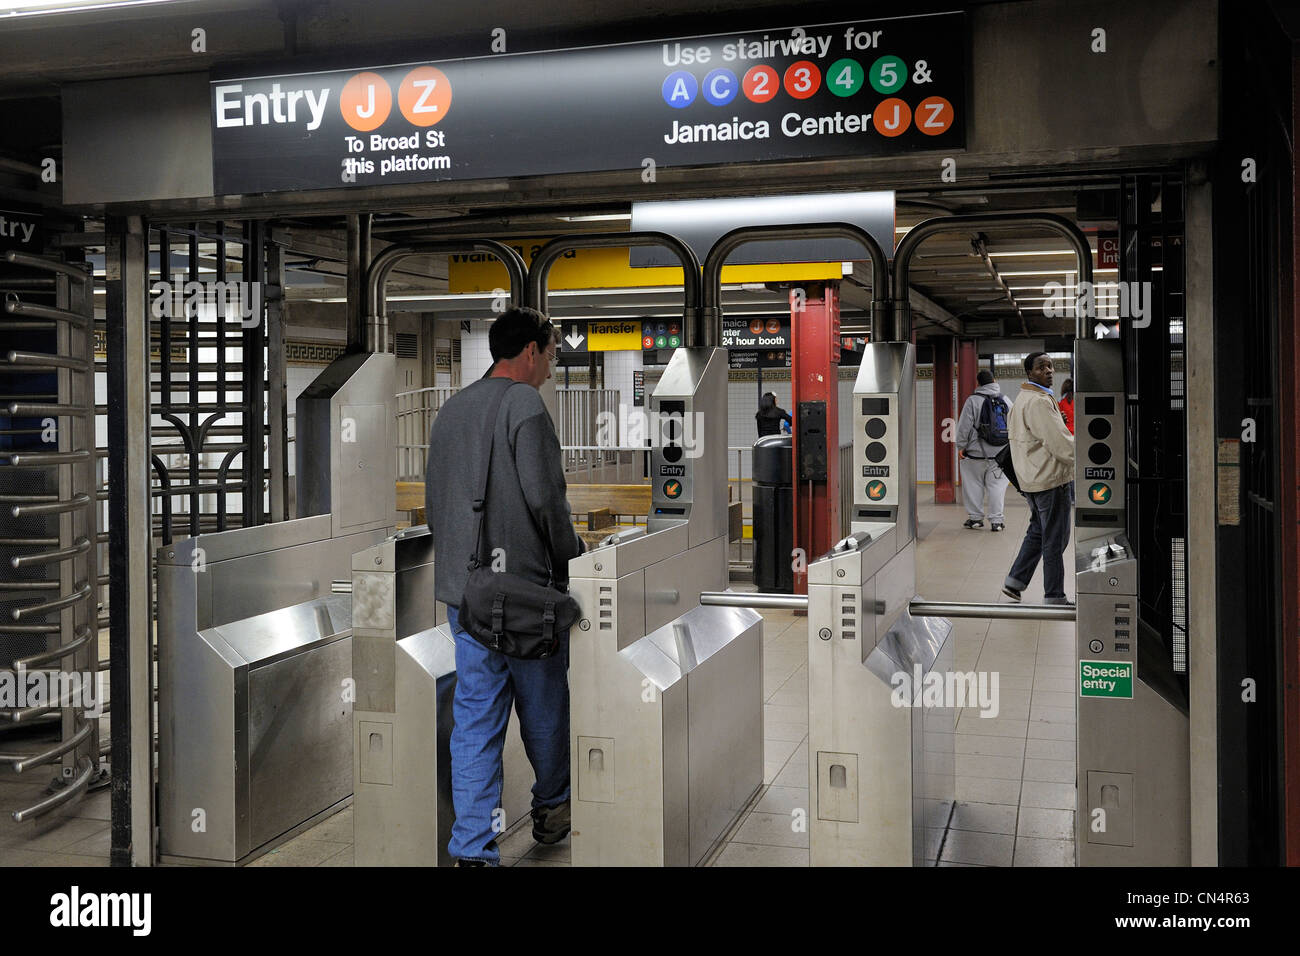 United States, New York, Manhattan, subway station - Stock Image